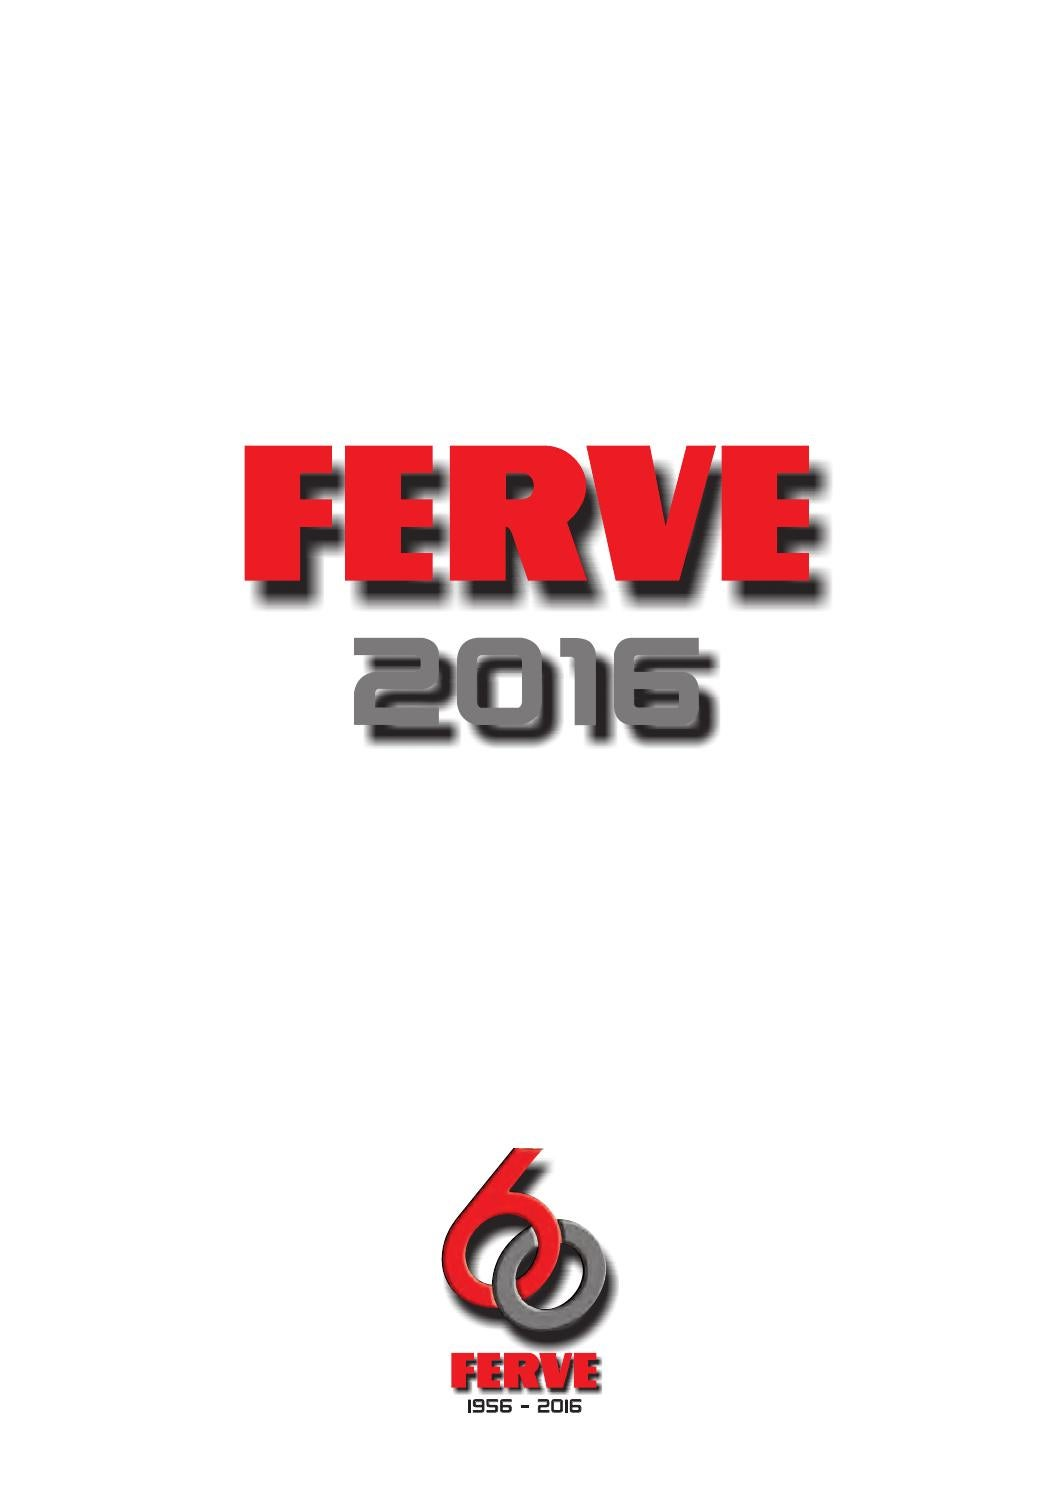 Catalogo ferve 2016 by Ruben Morcillo - issuu